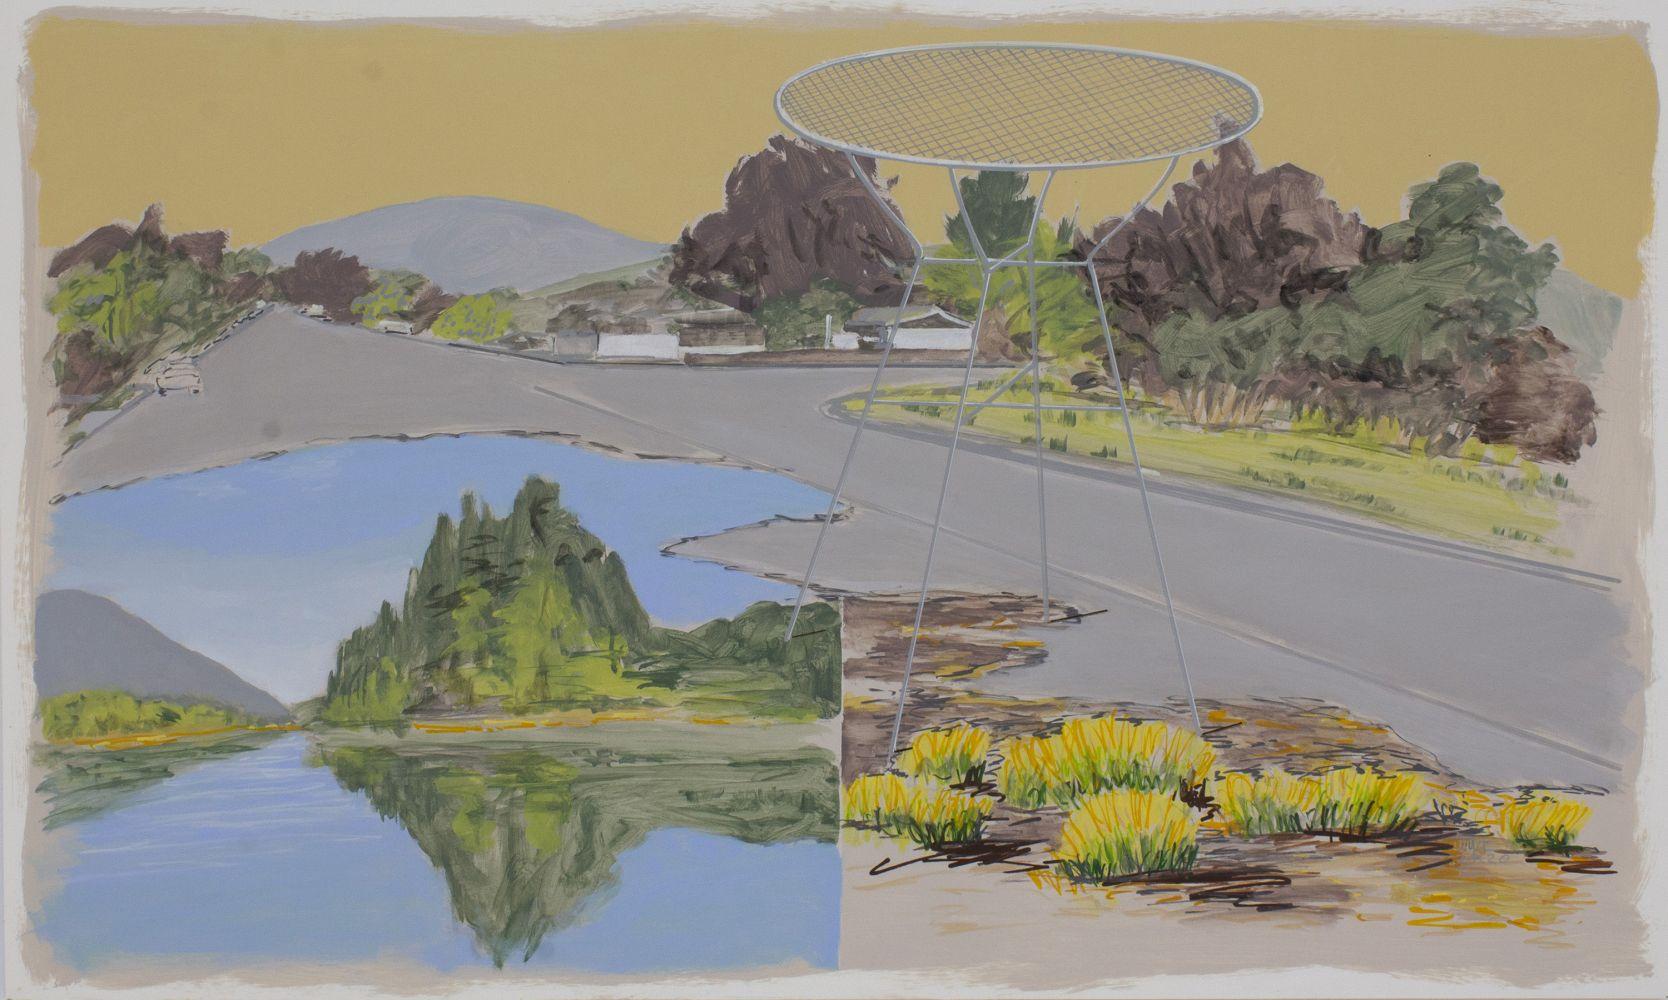 William Leavitt, Island, street, table, bushes, 2020